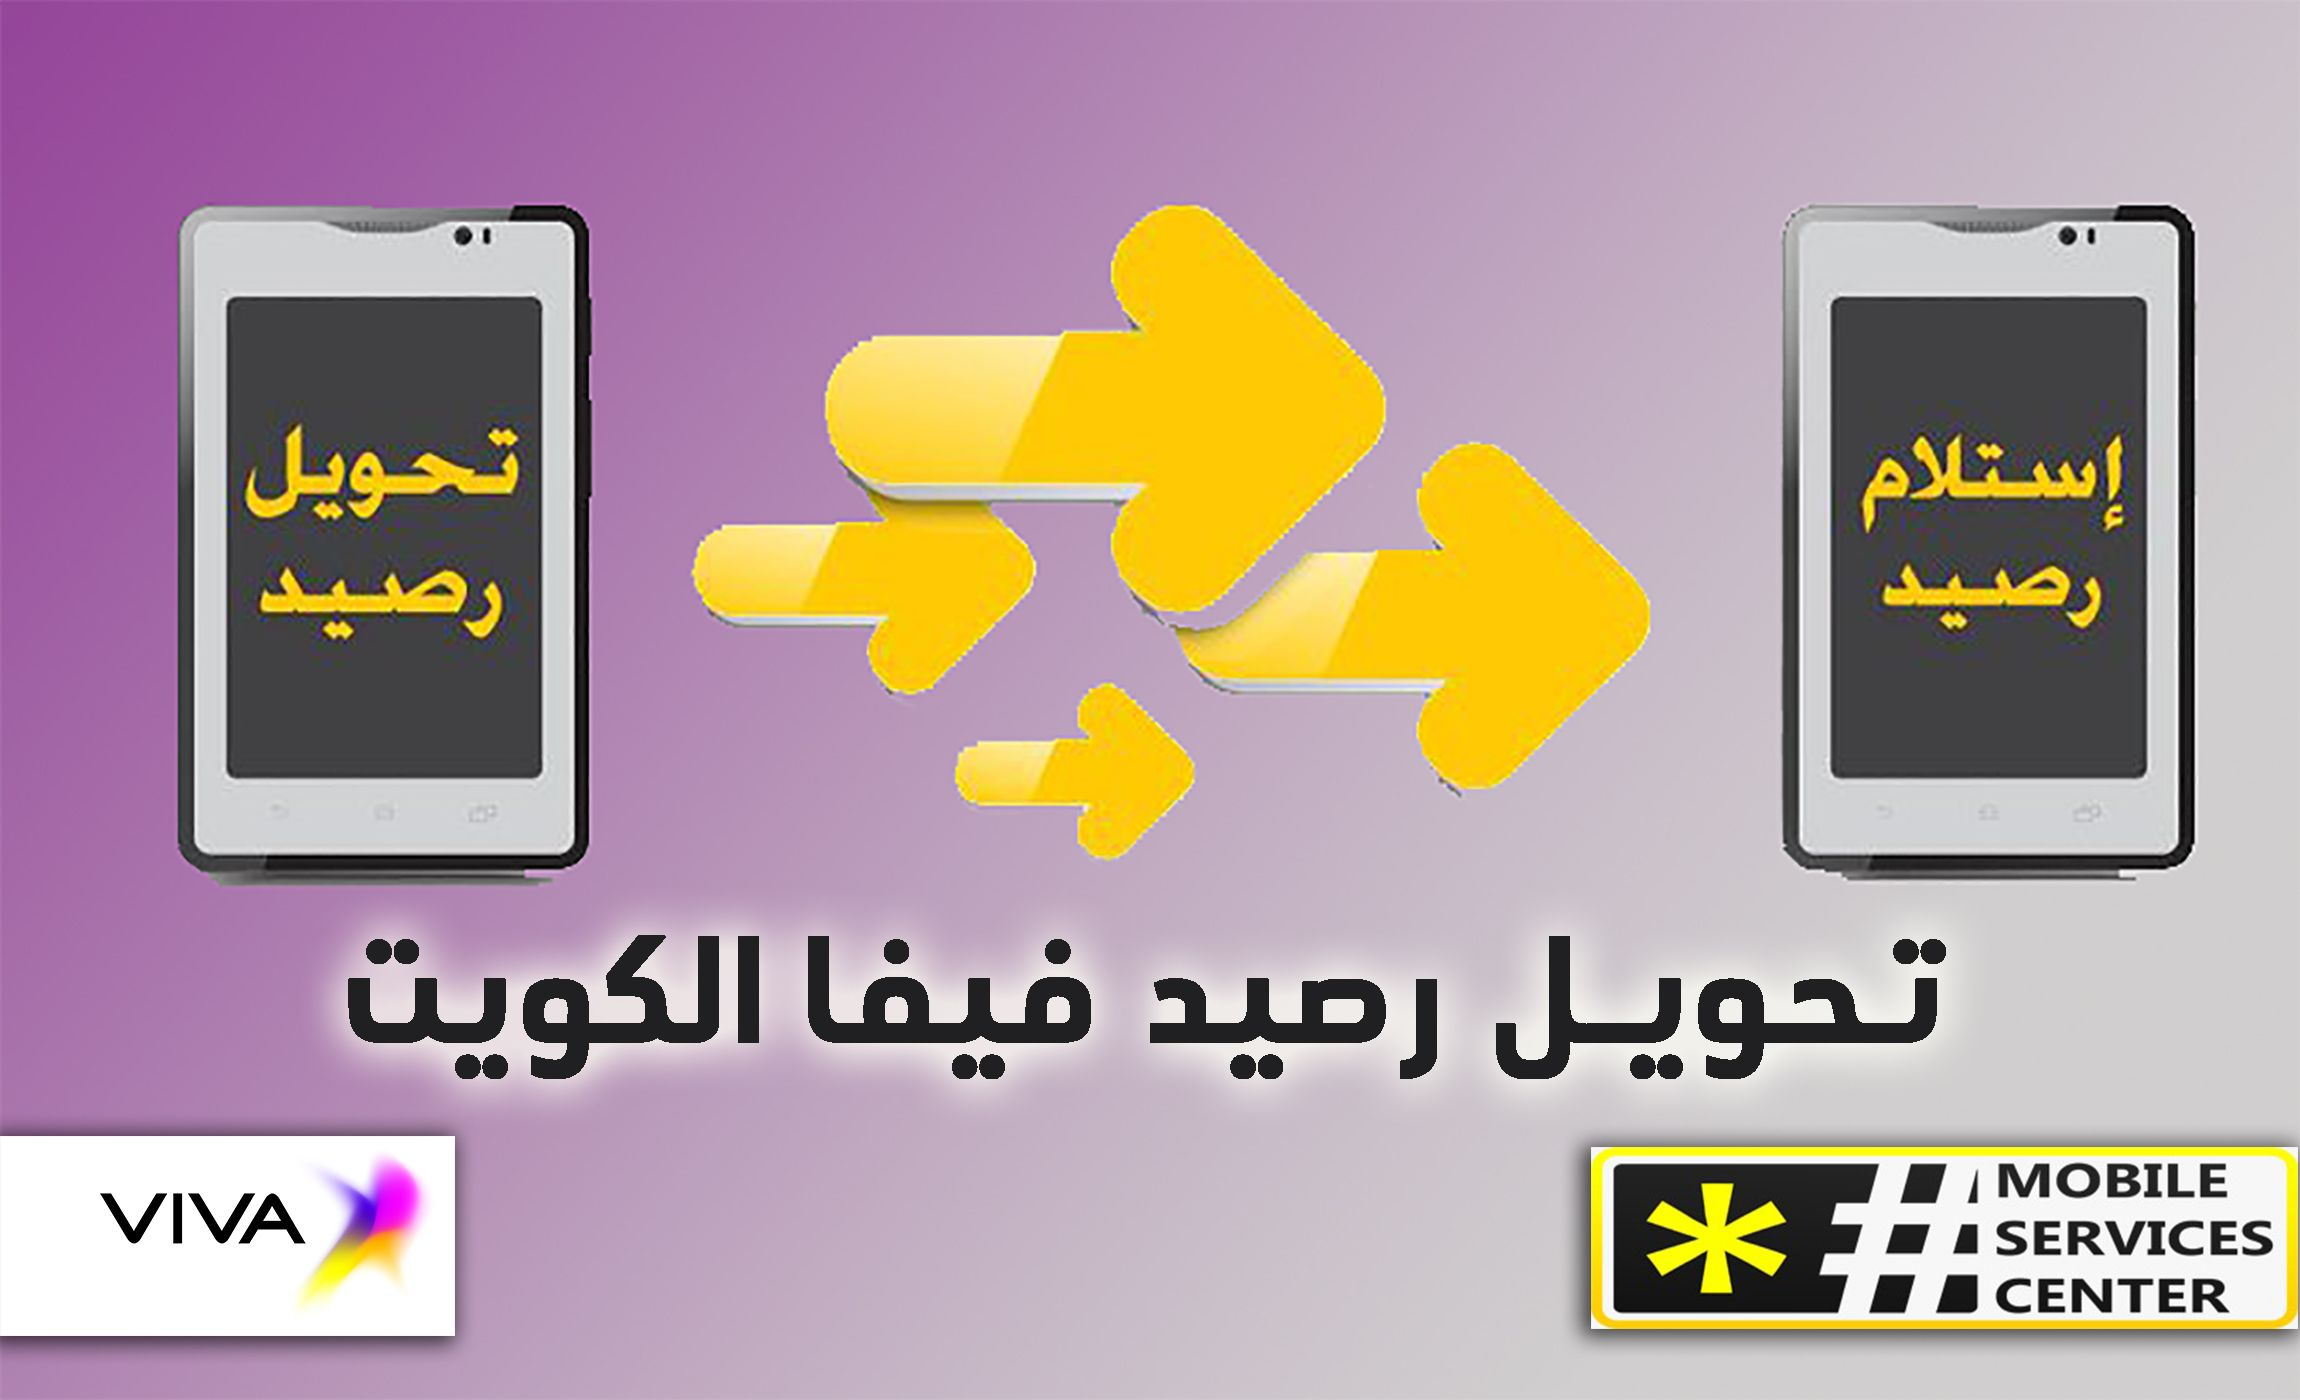 تحويل رصيد فيفا Mix Photo Phone Electronic Products